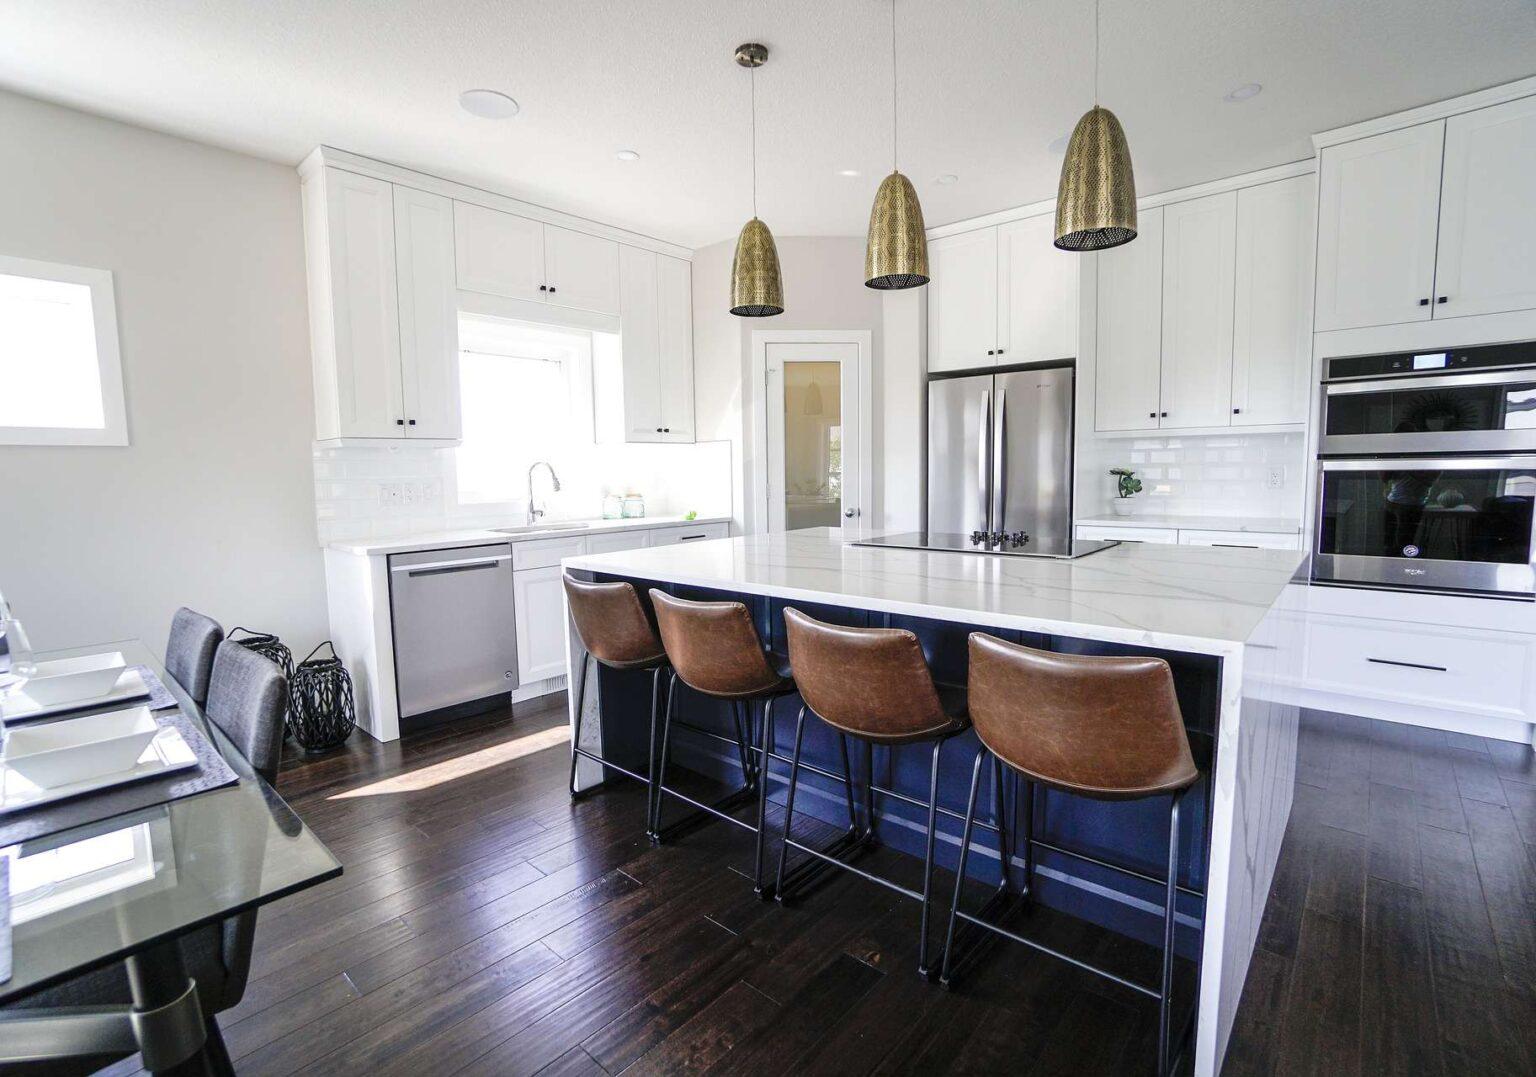 Standard Depth of Kitchen Cabinets